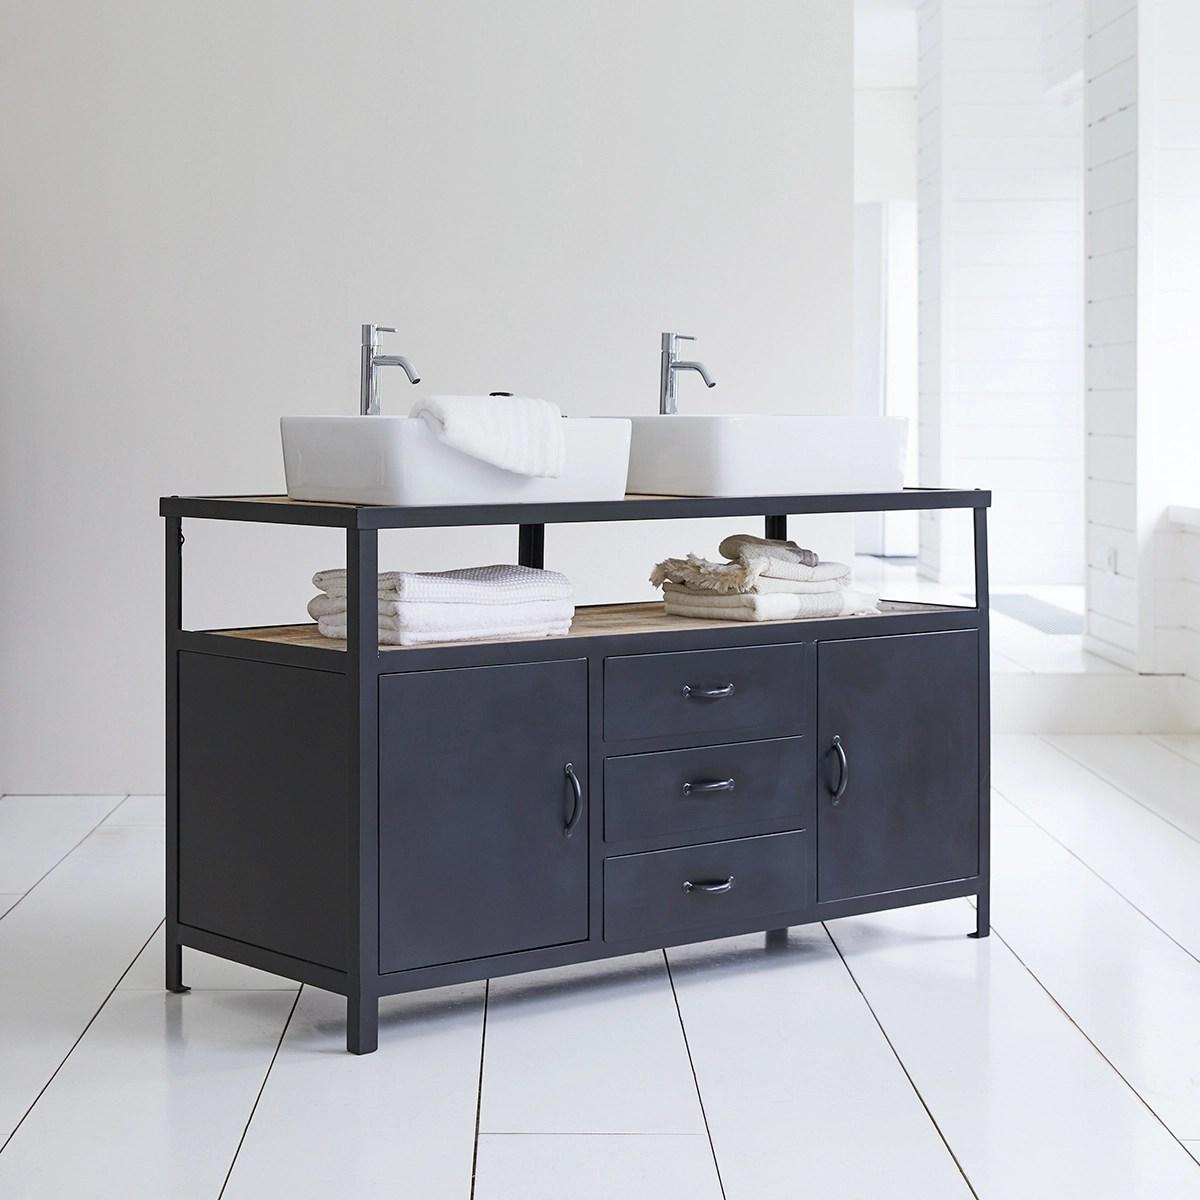 meuble salle de bain en metal et manguier 140 industriel